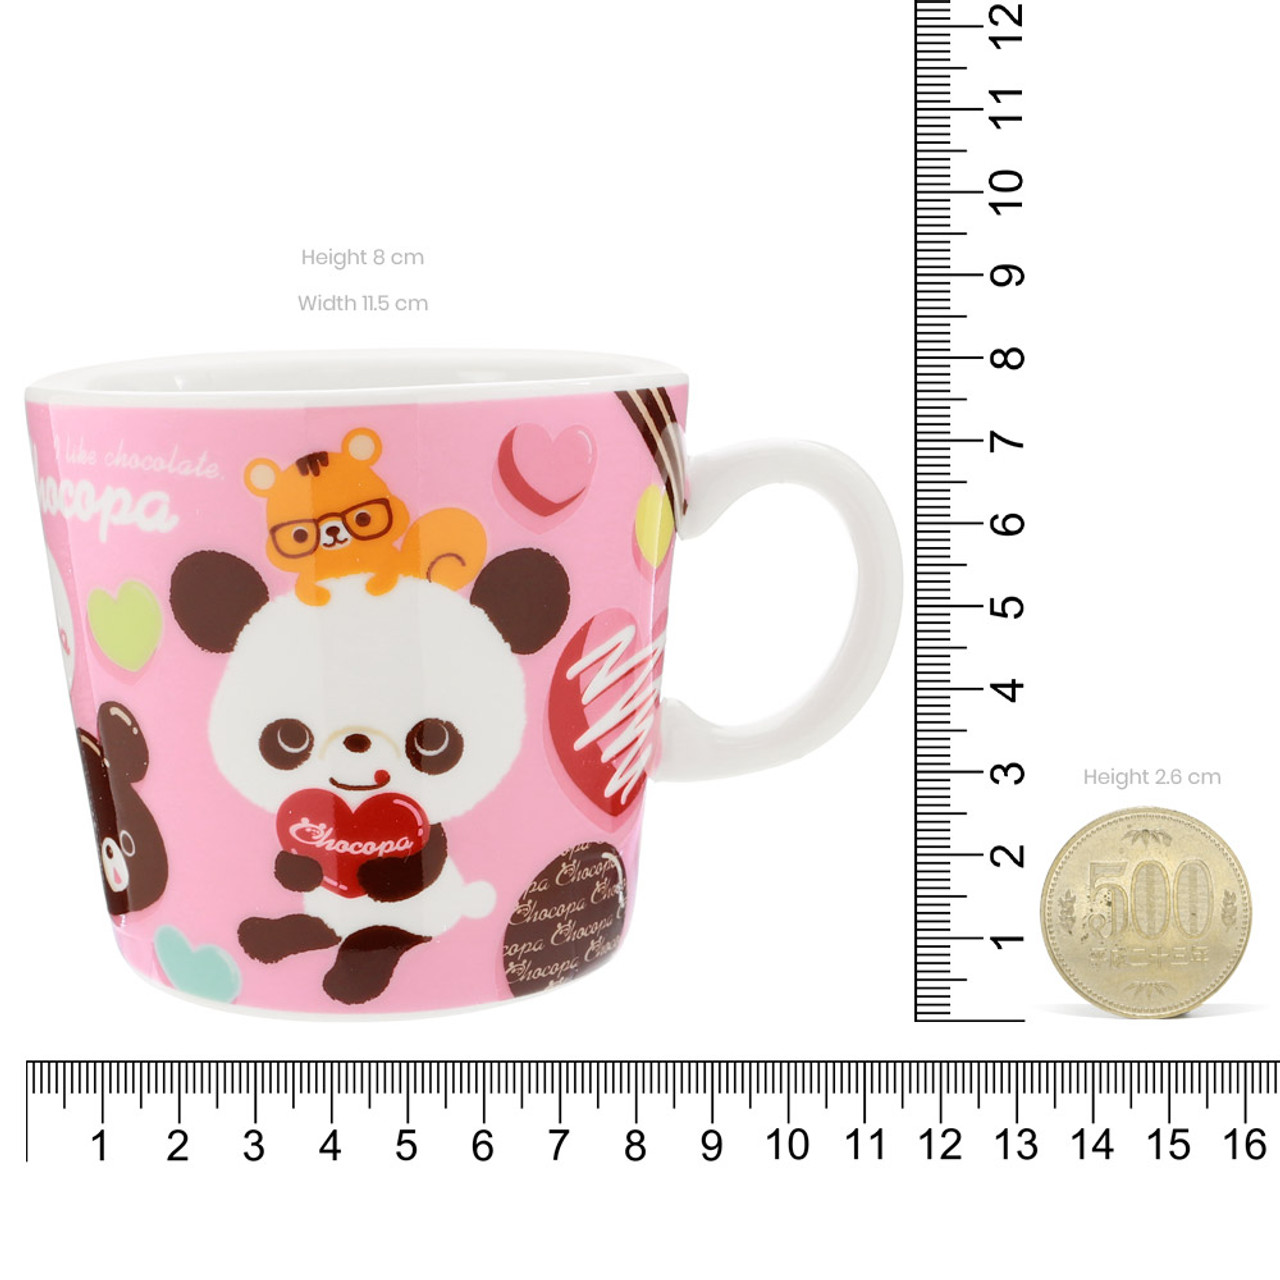 San-x Chocopa Panda Pink Porcelain Cup ( Proportion )